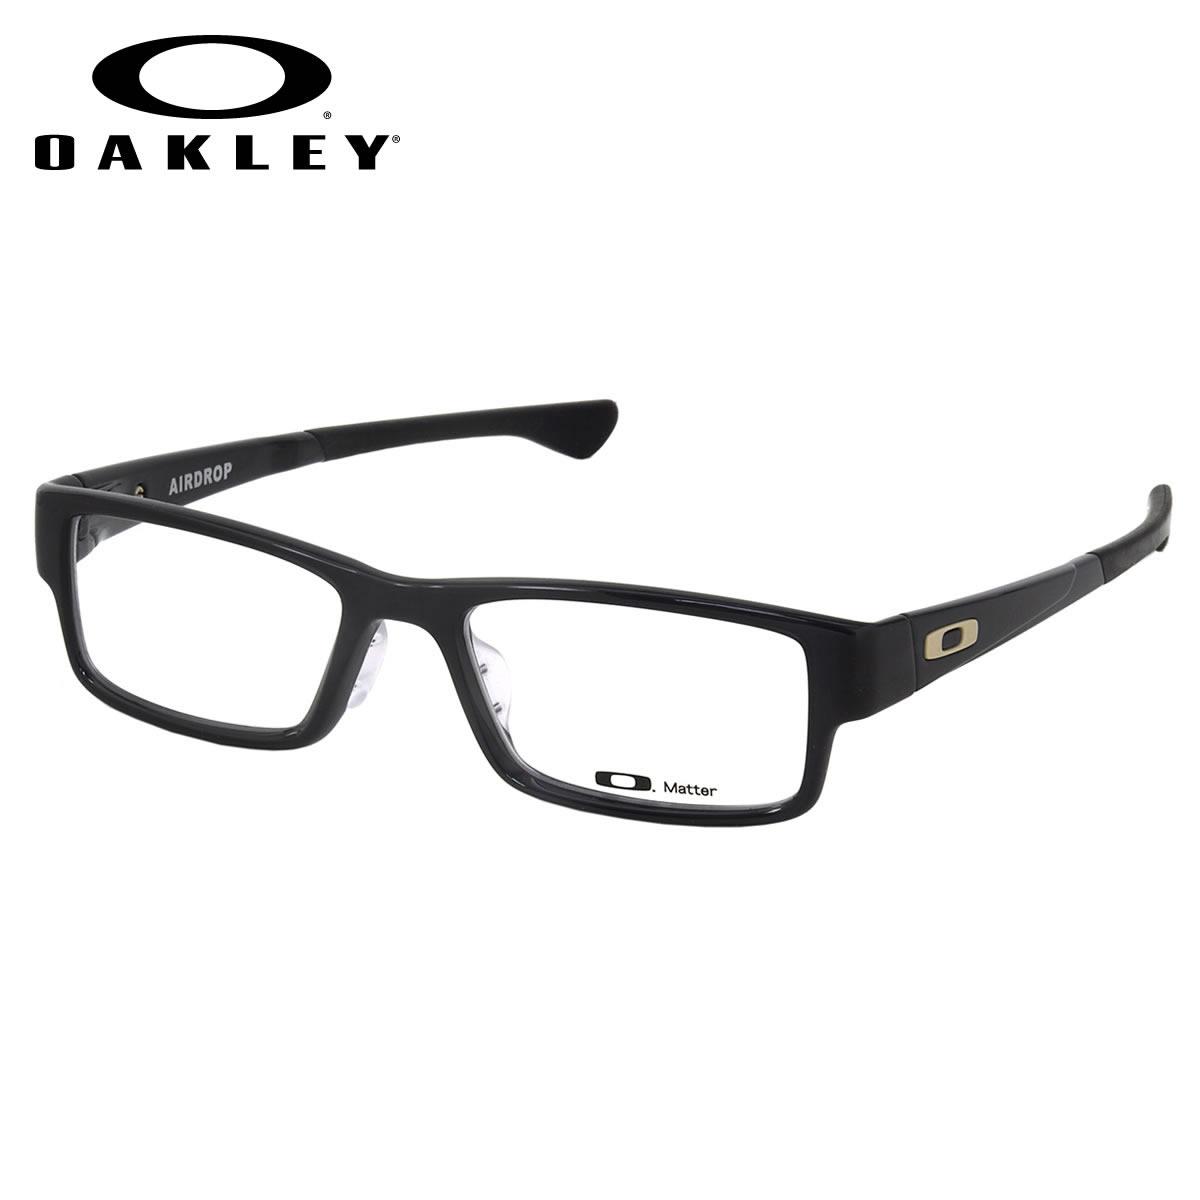 9dea5bd076 OAKLEY-glasses OX8065-0155 AIRDROP ASIA FIT Black Ink red Asian fit square  OAKLEY ITA eyeglass lens free men women